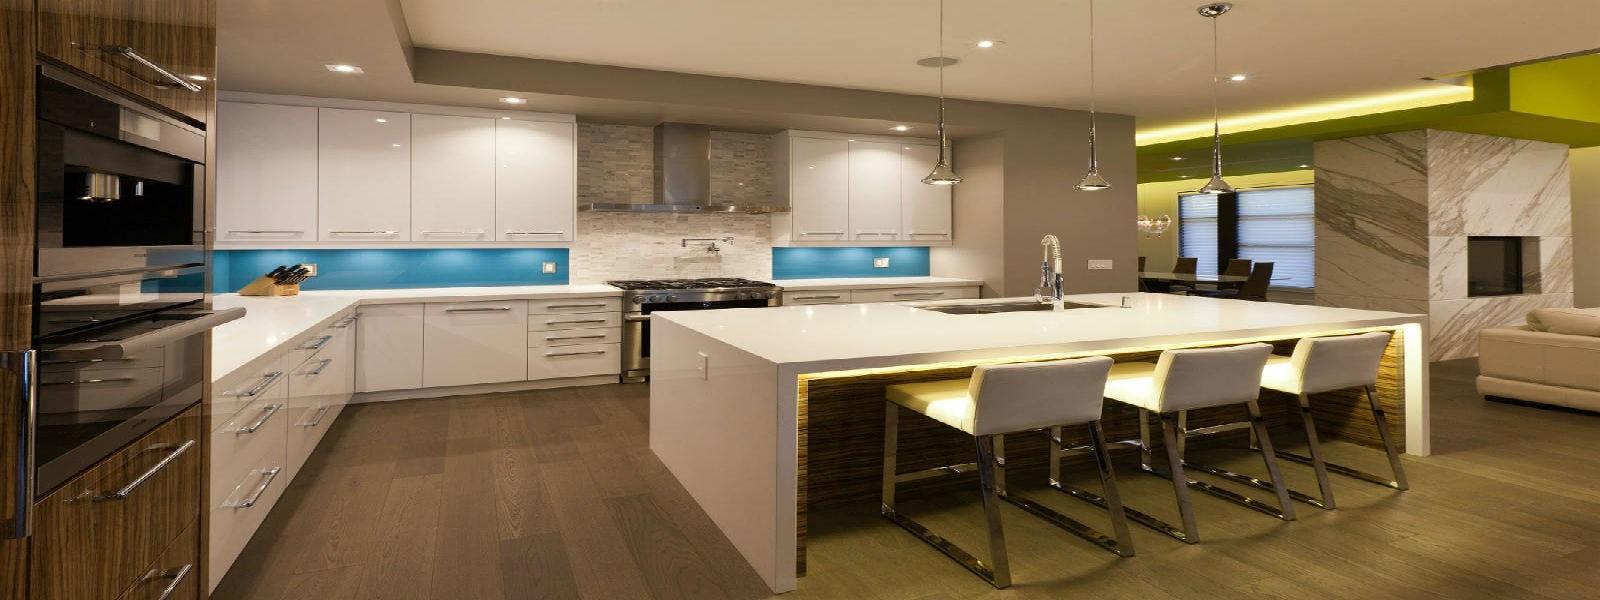 Slider 1 – white acrylic cabinets